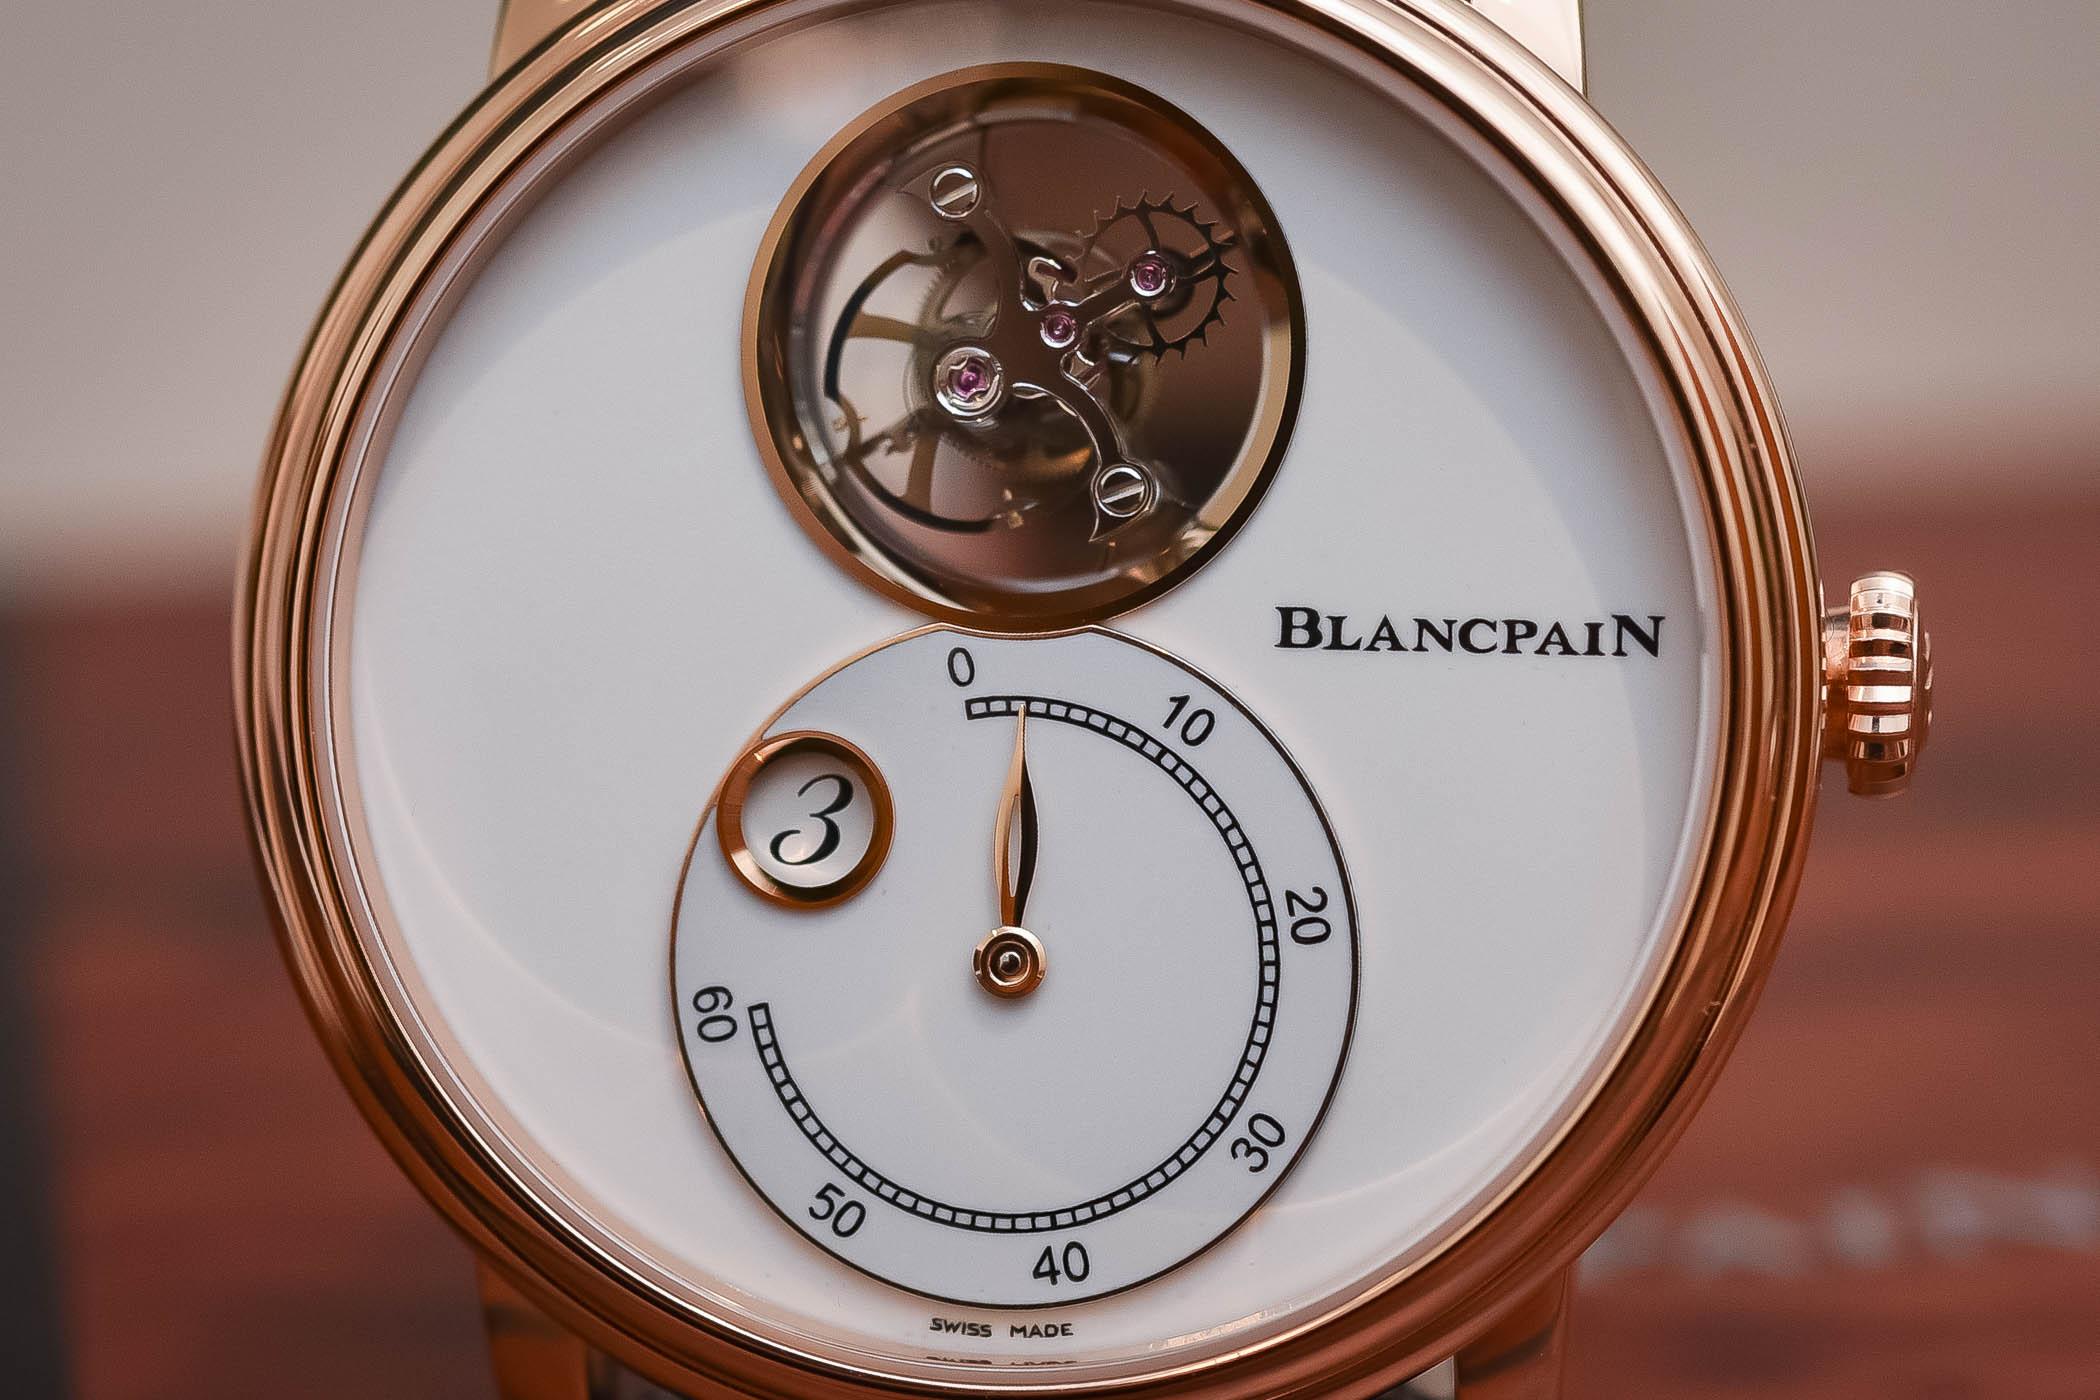 Blancpain Villeret Tourbillon Volant Heure Sautante Minute Retrograde - Baselworld 2018